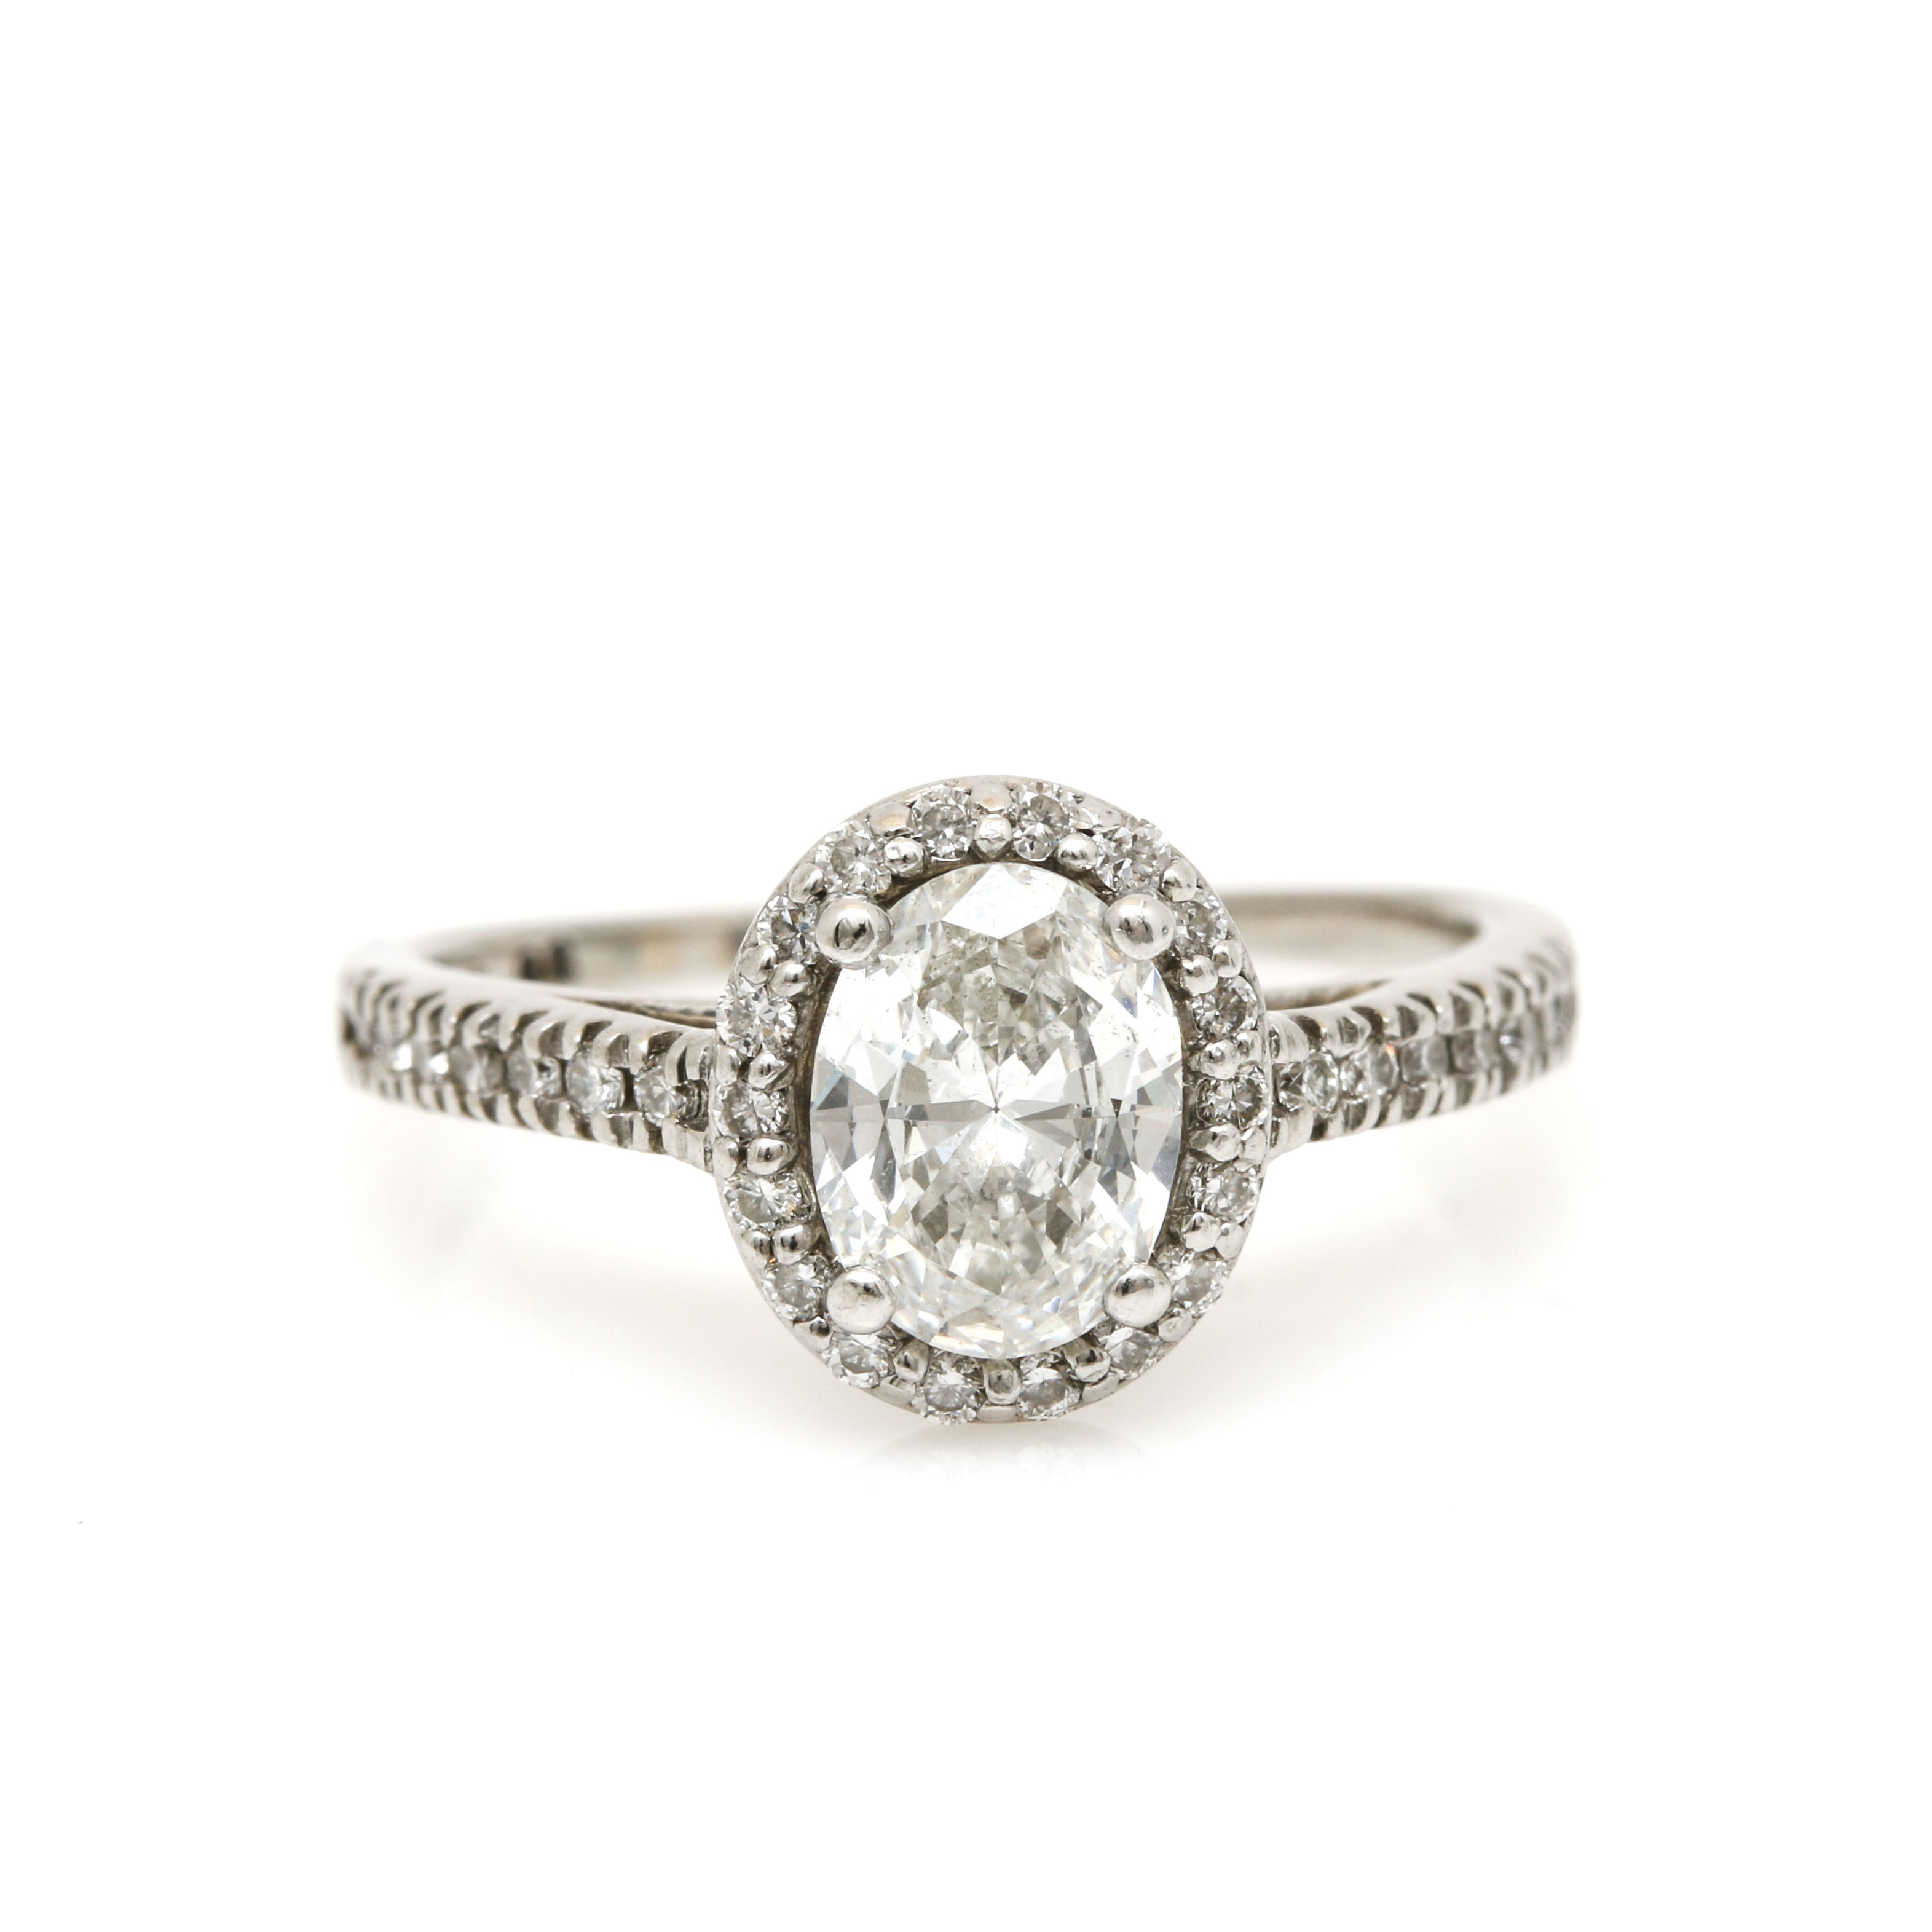 14K White Gold 1.06 CTW Diamond Ring